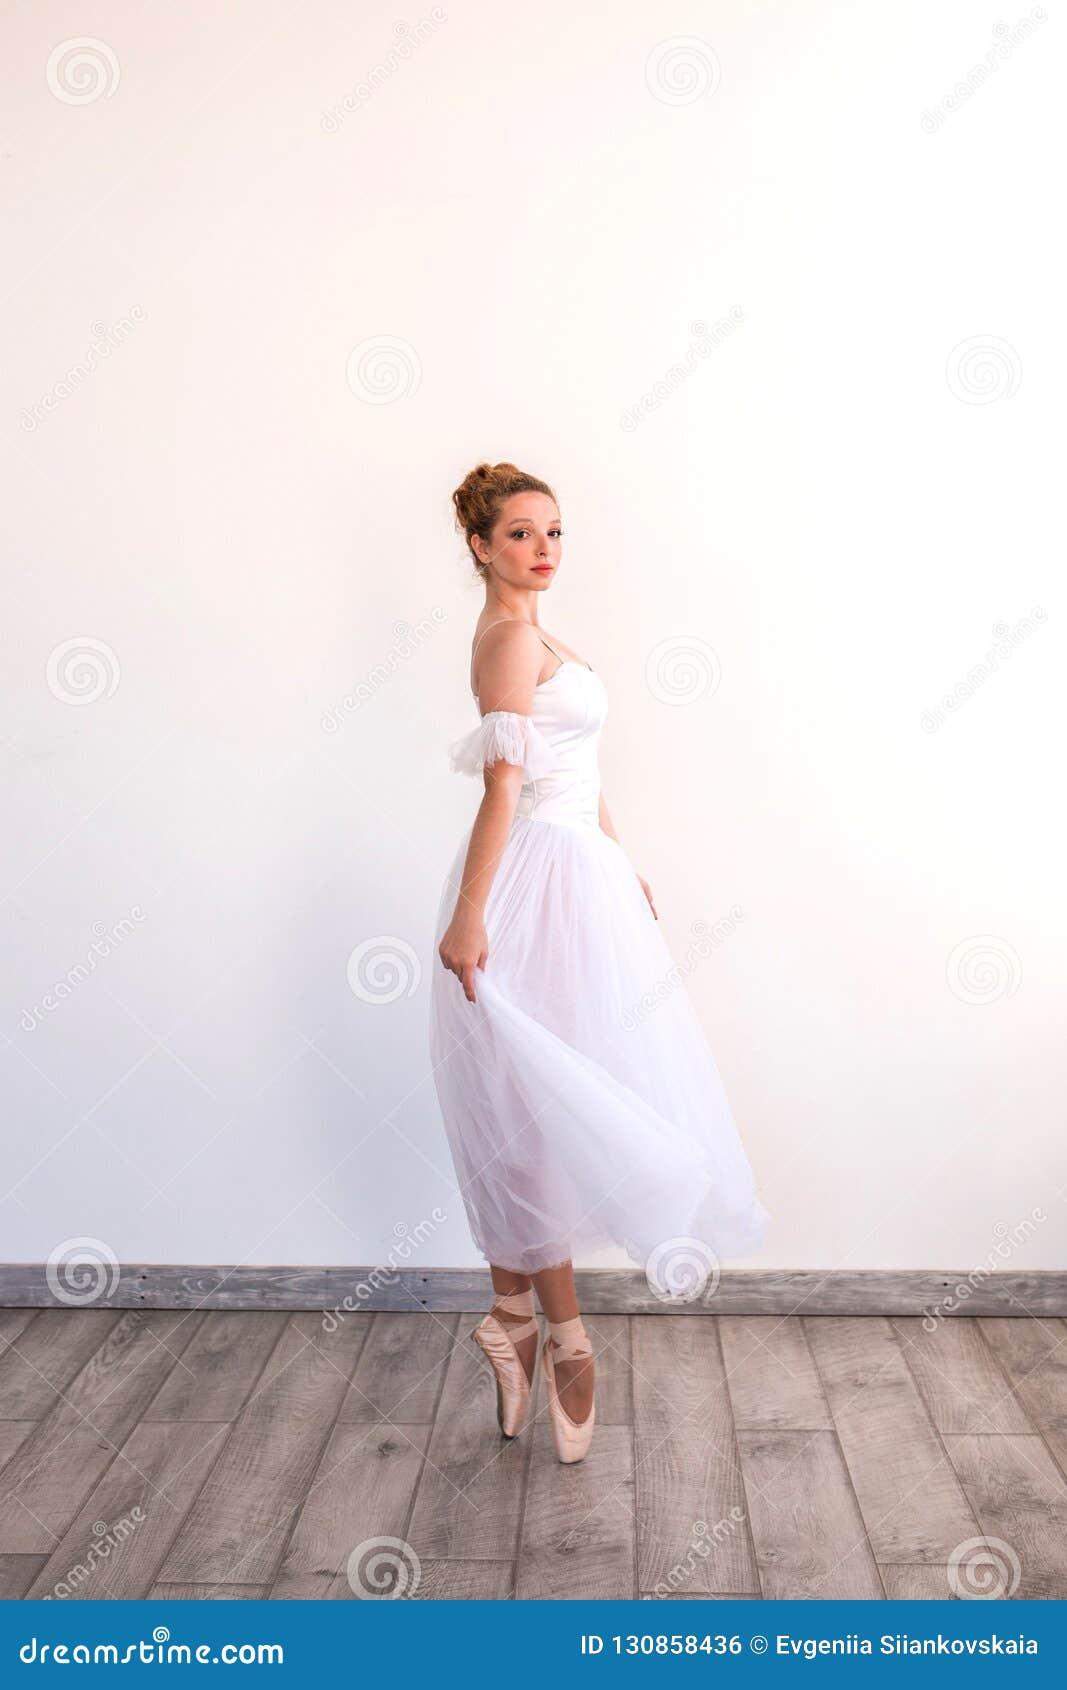 Young graceful ballerina dancing on white studio.